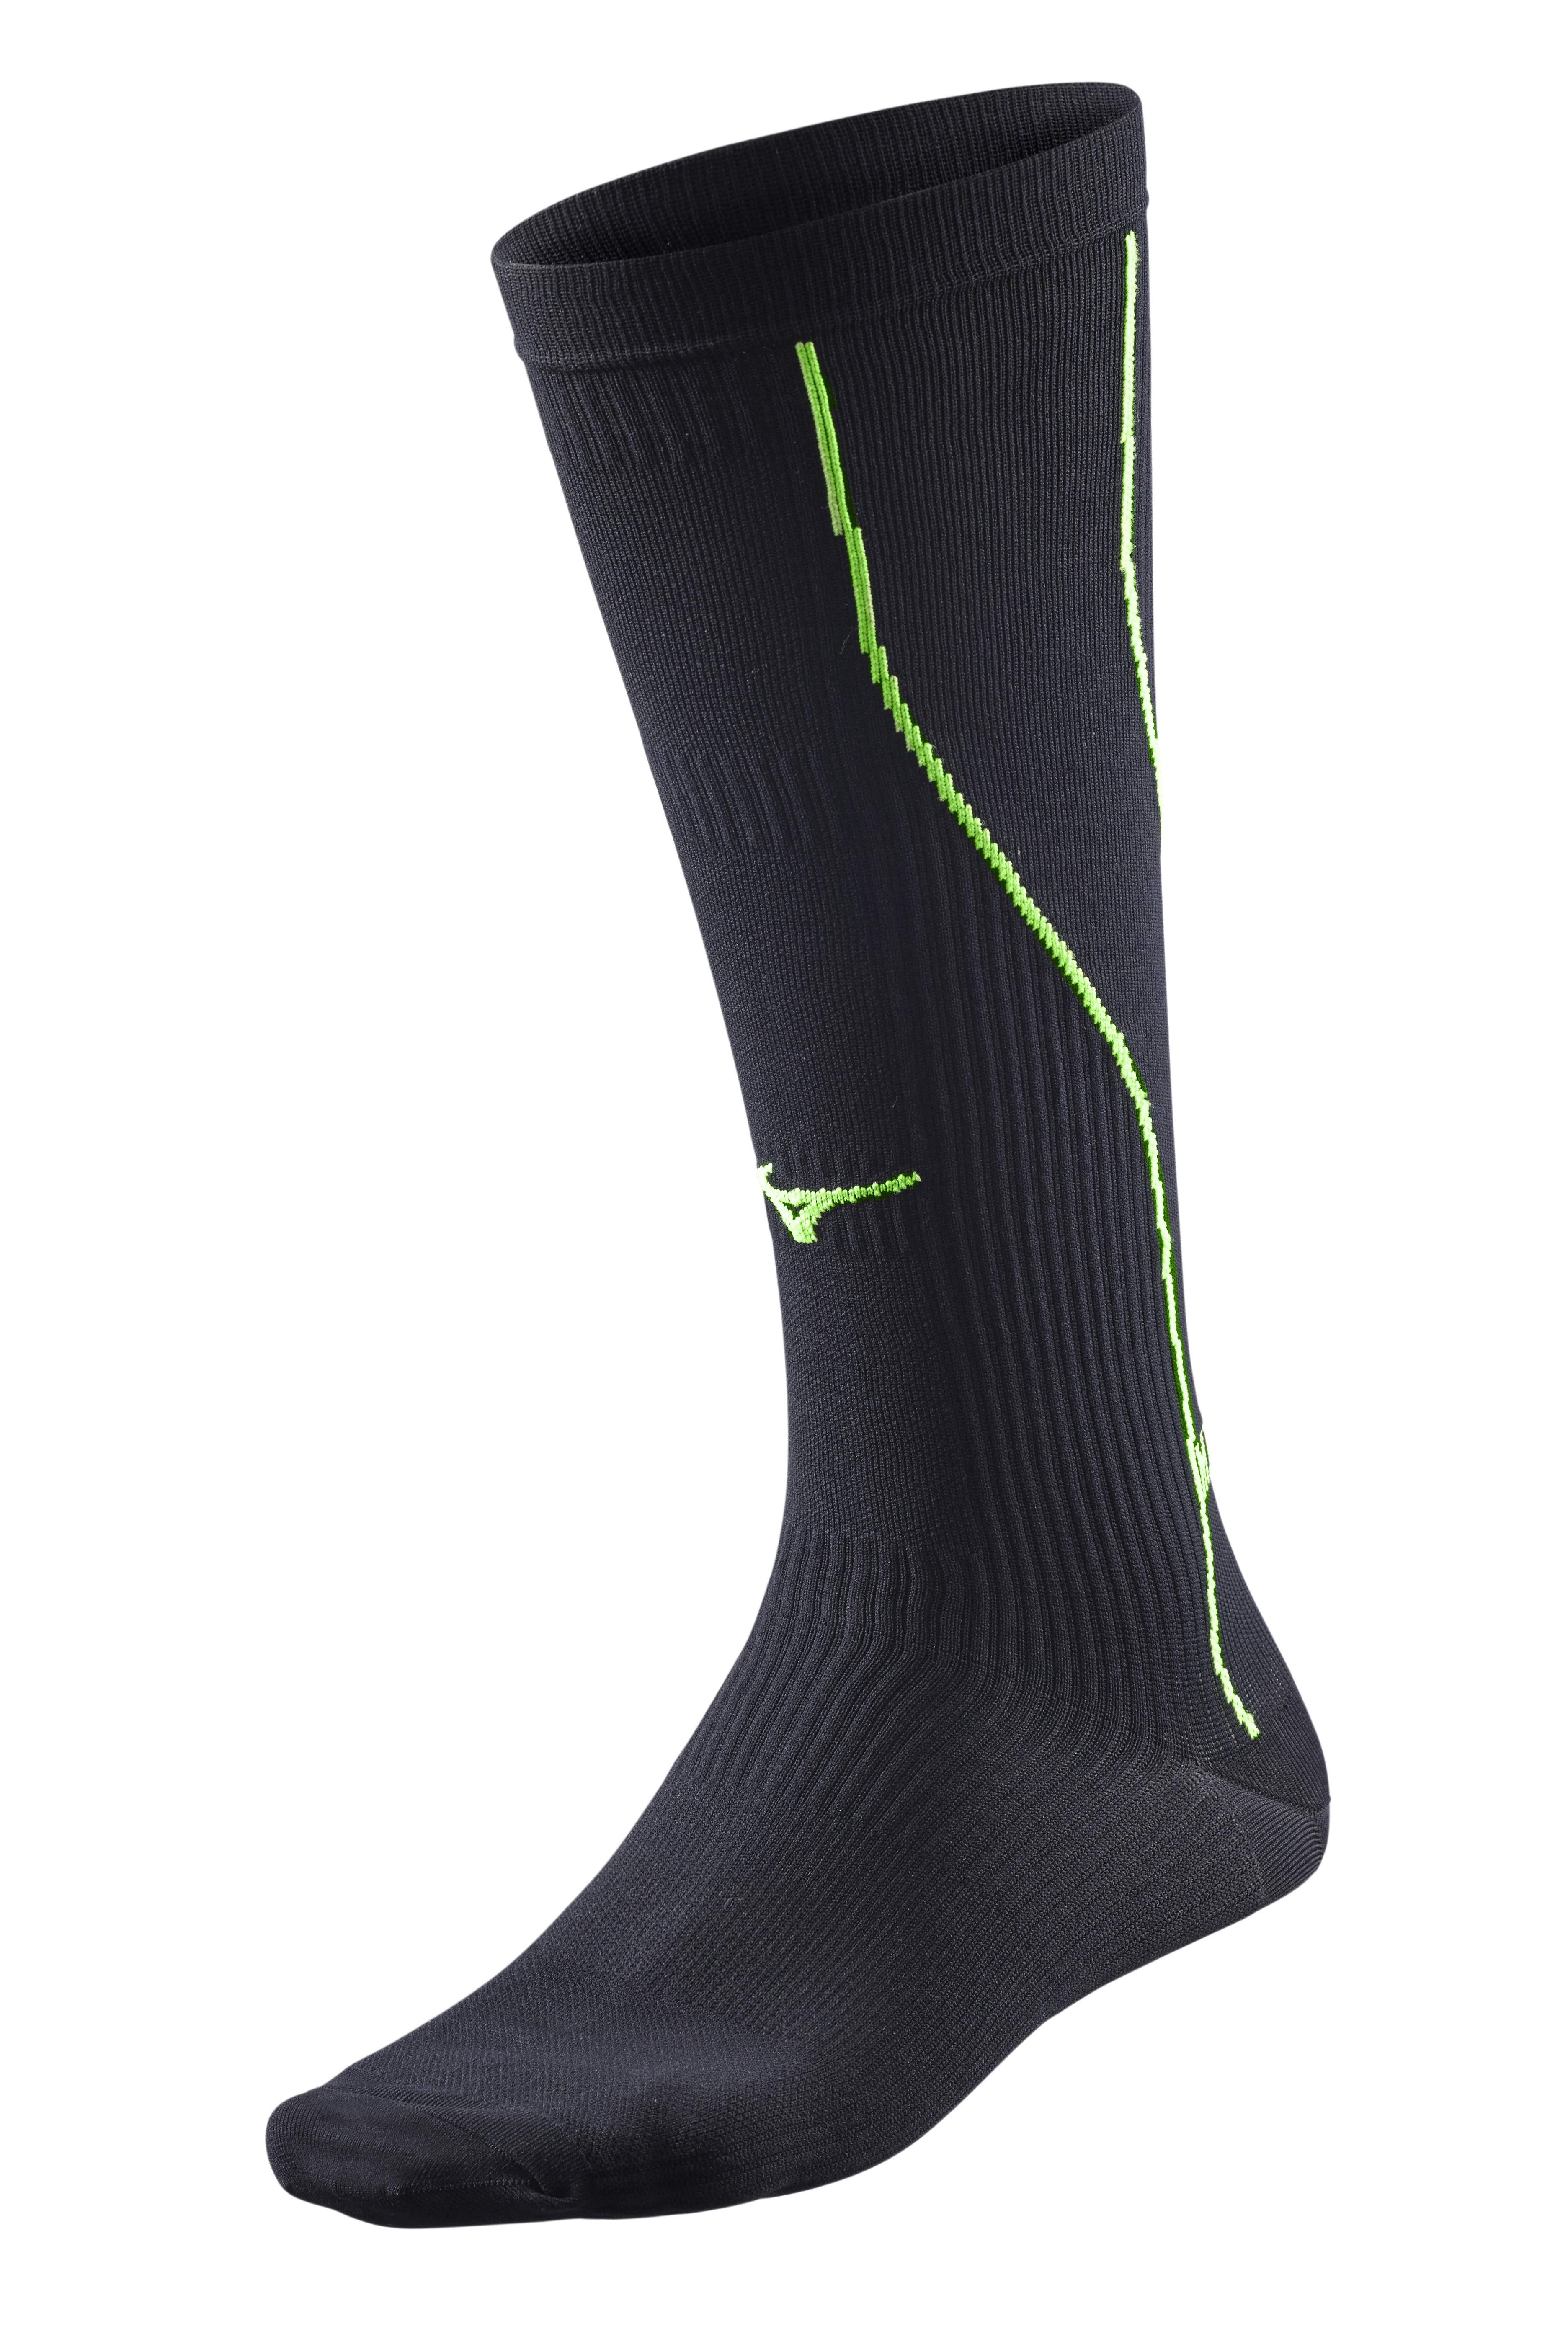 Mizuno Compression Socks J2GX5A10Z97 S